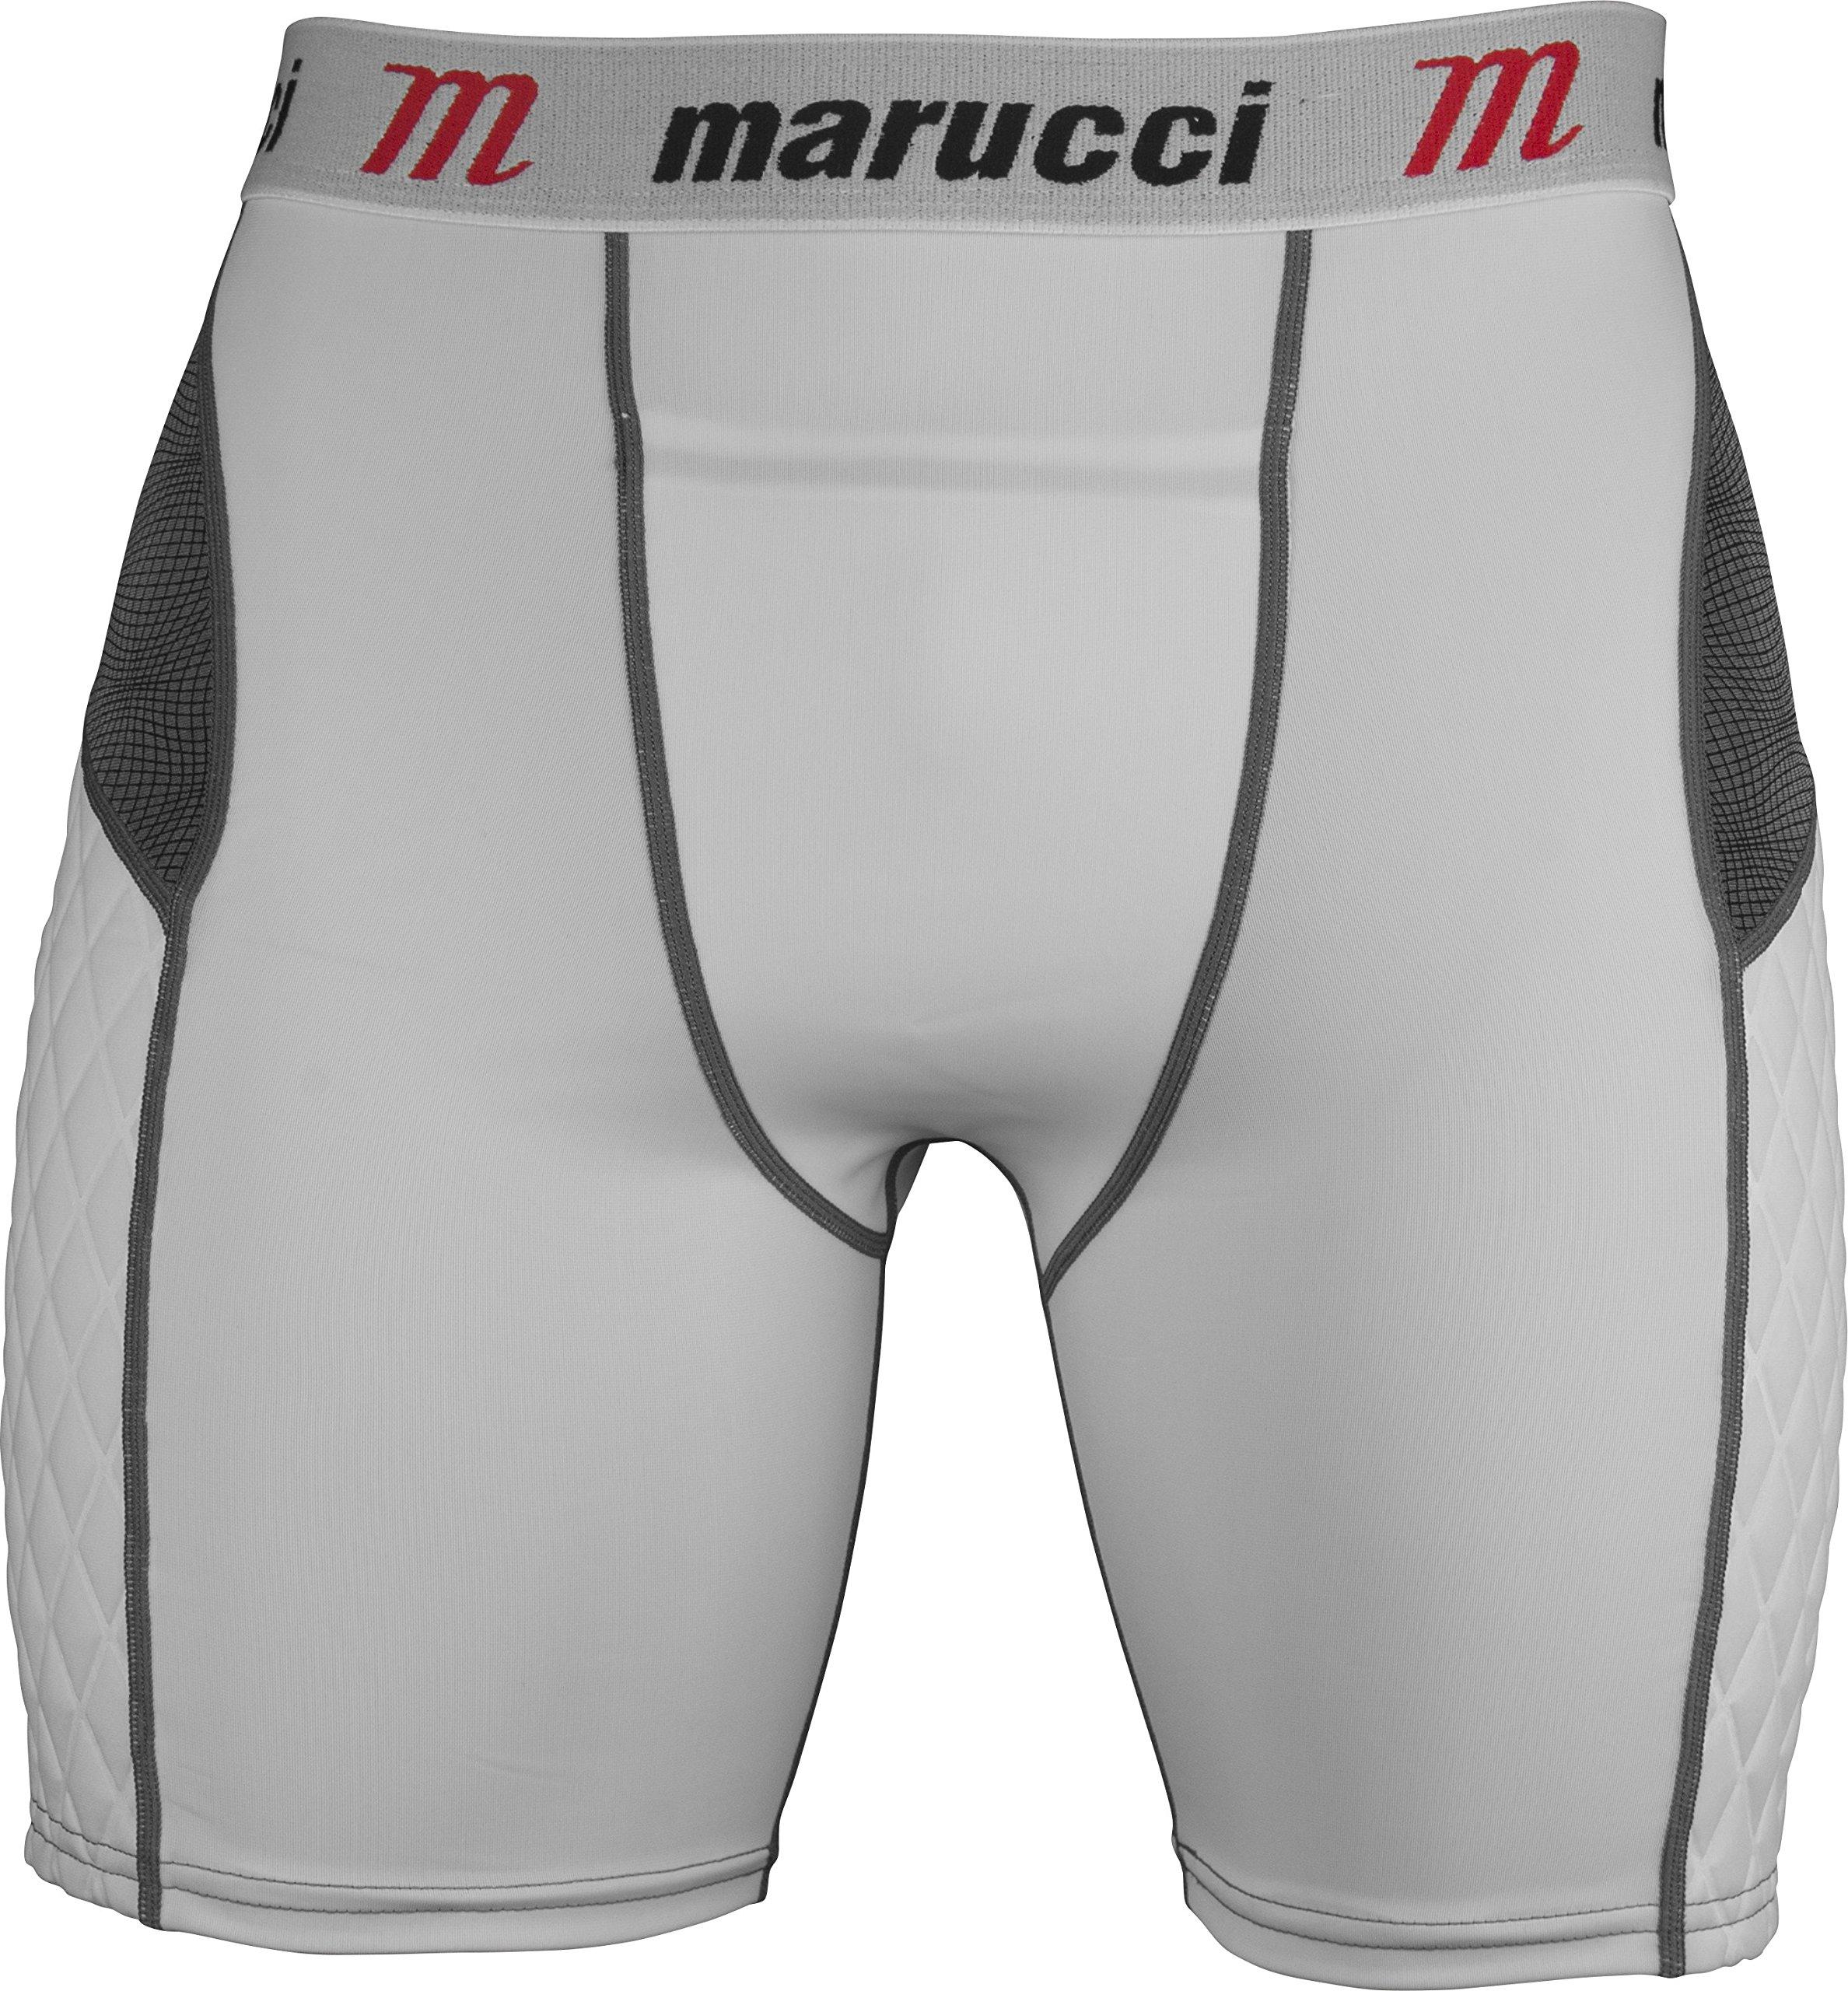 Marucci Adult Elite Padded Slider Shorts, Medium, White